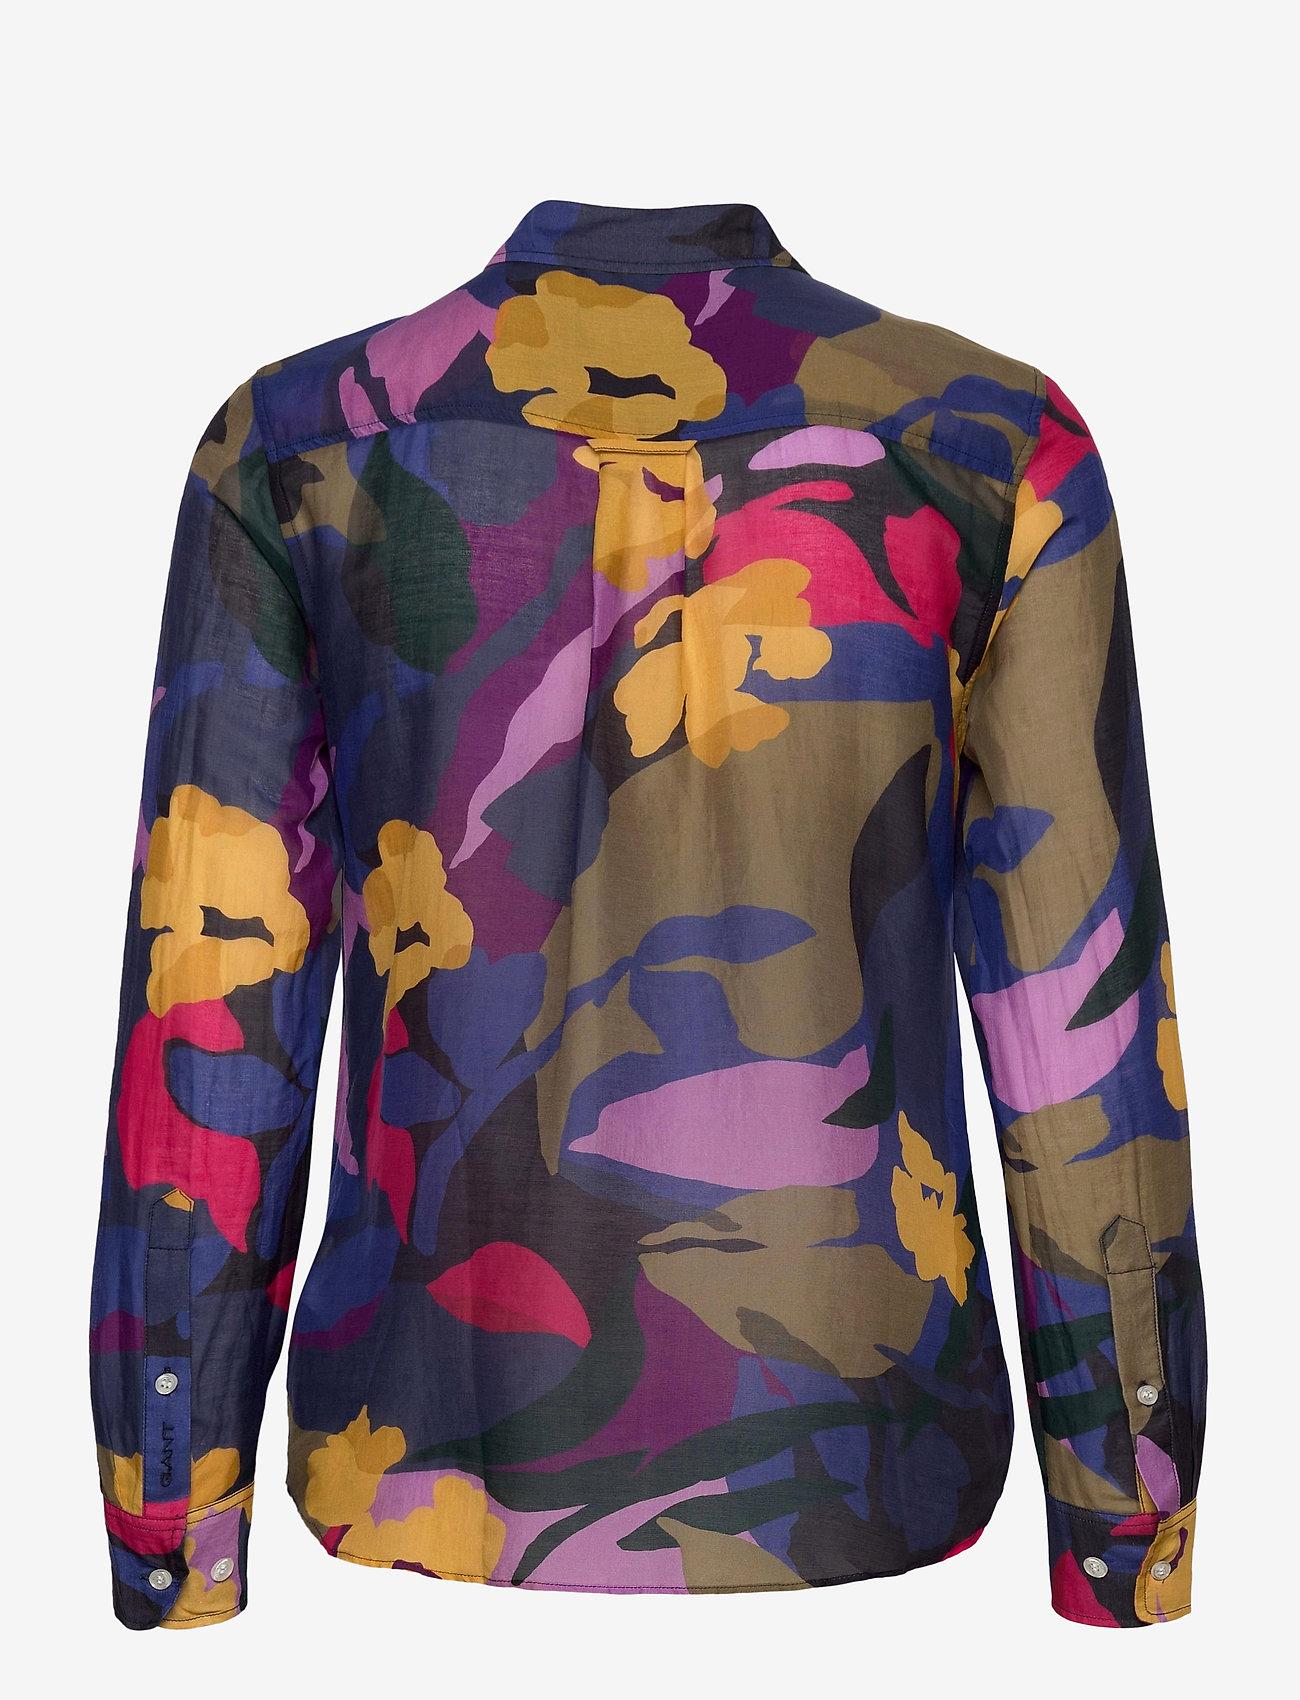 GANT - D1. SPLENDID FLORAL COT SILK SHIRT - long-sleeved shirts - multicolor - 1